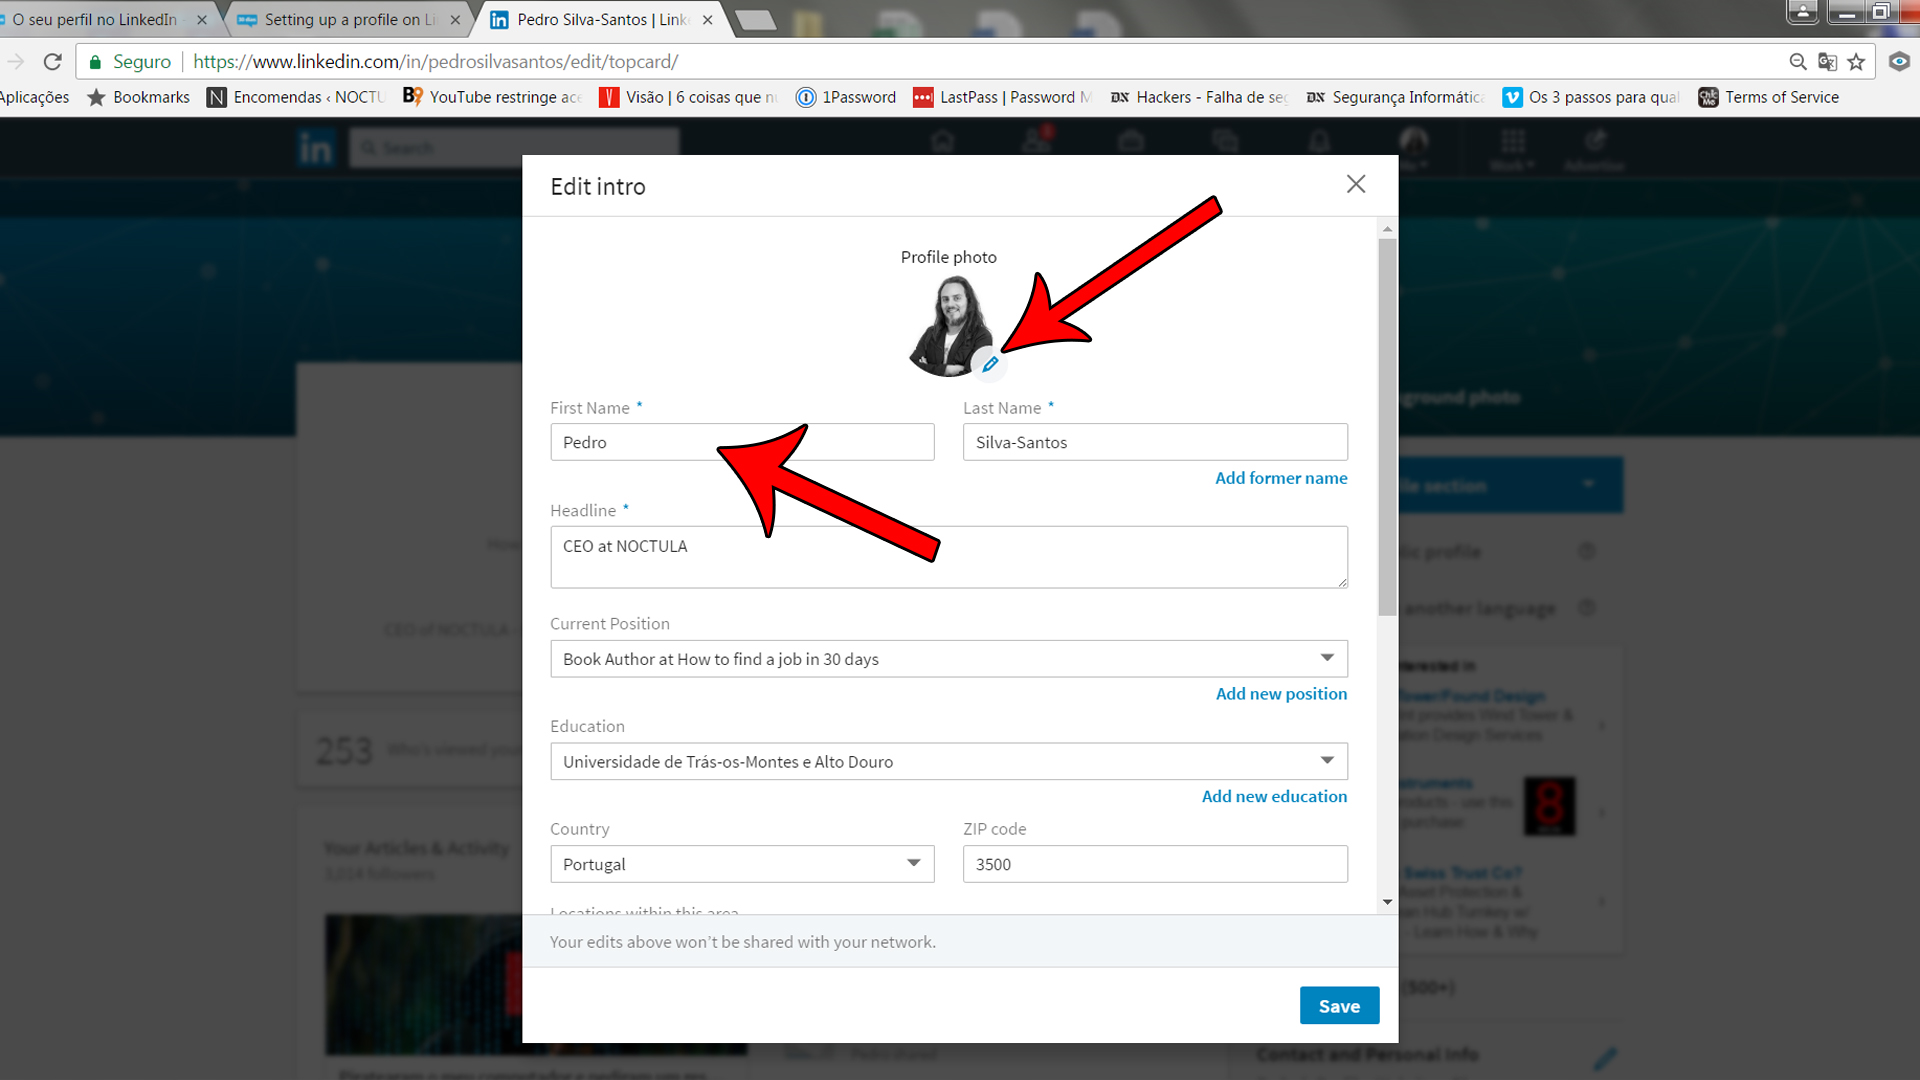 Setting up a profile on LinkedIn_02_000